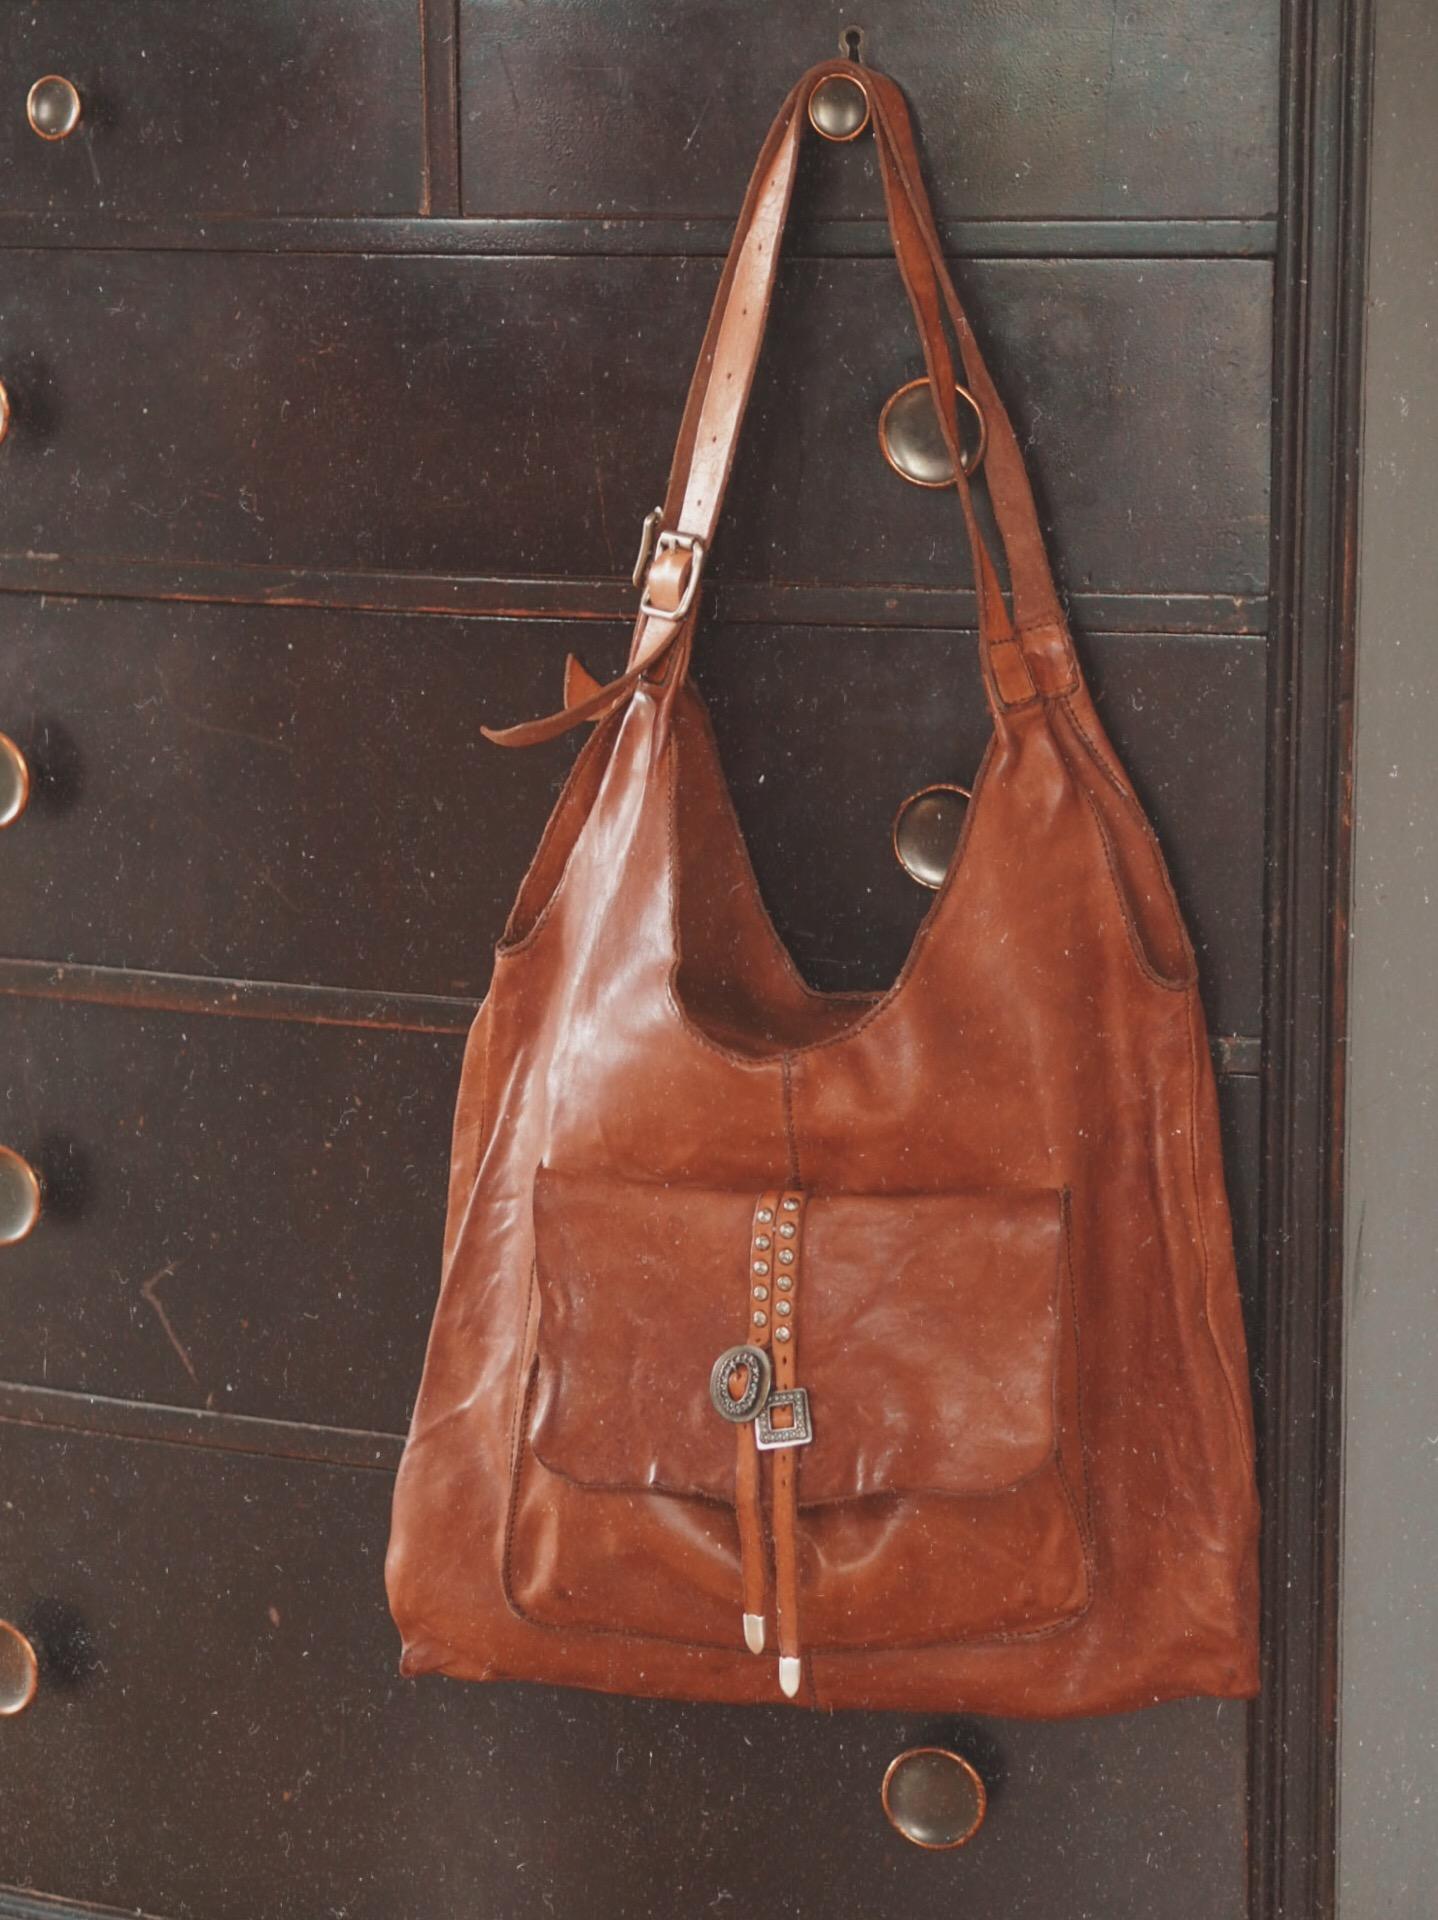 capusle wardrobe purse